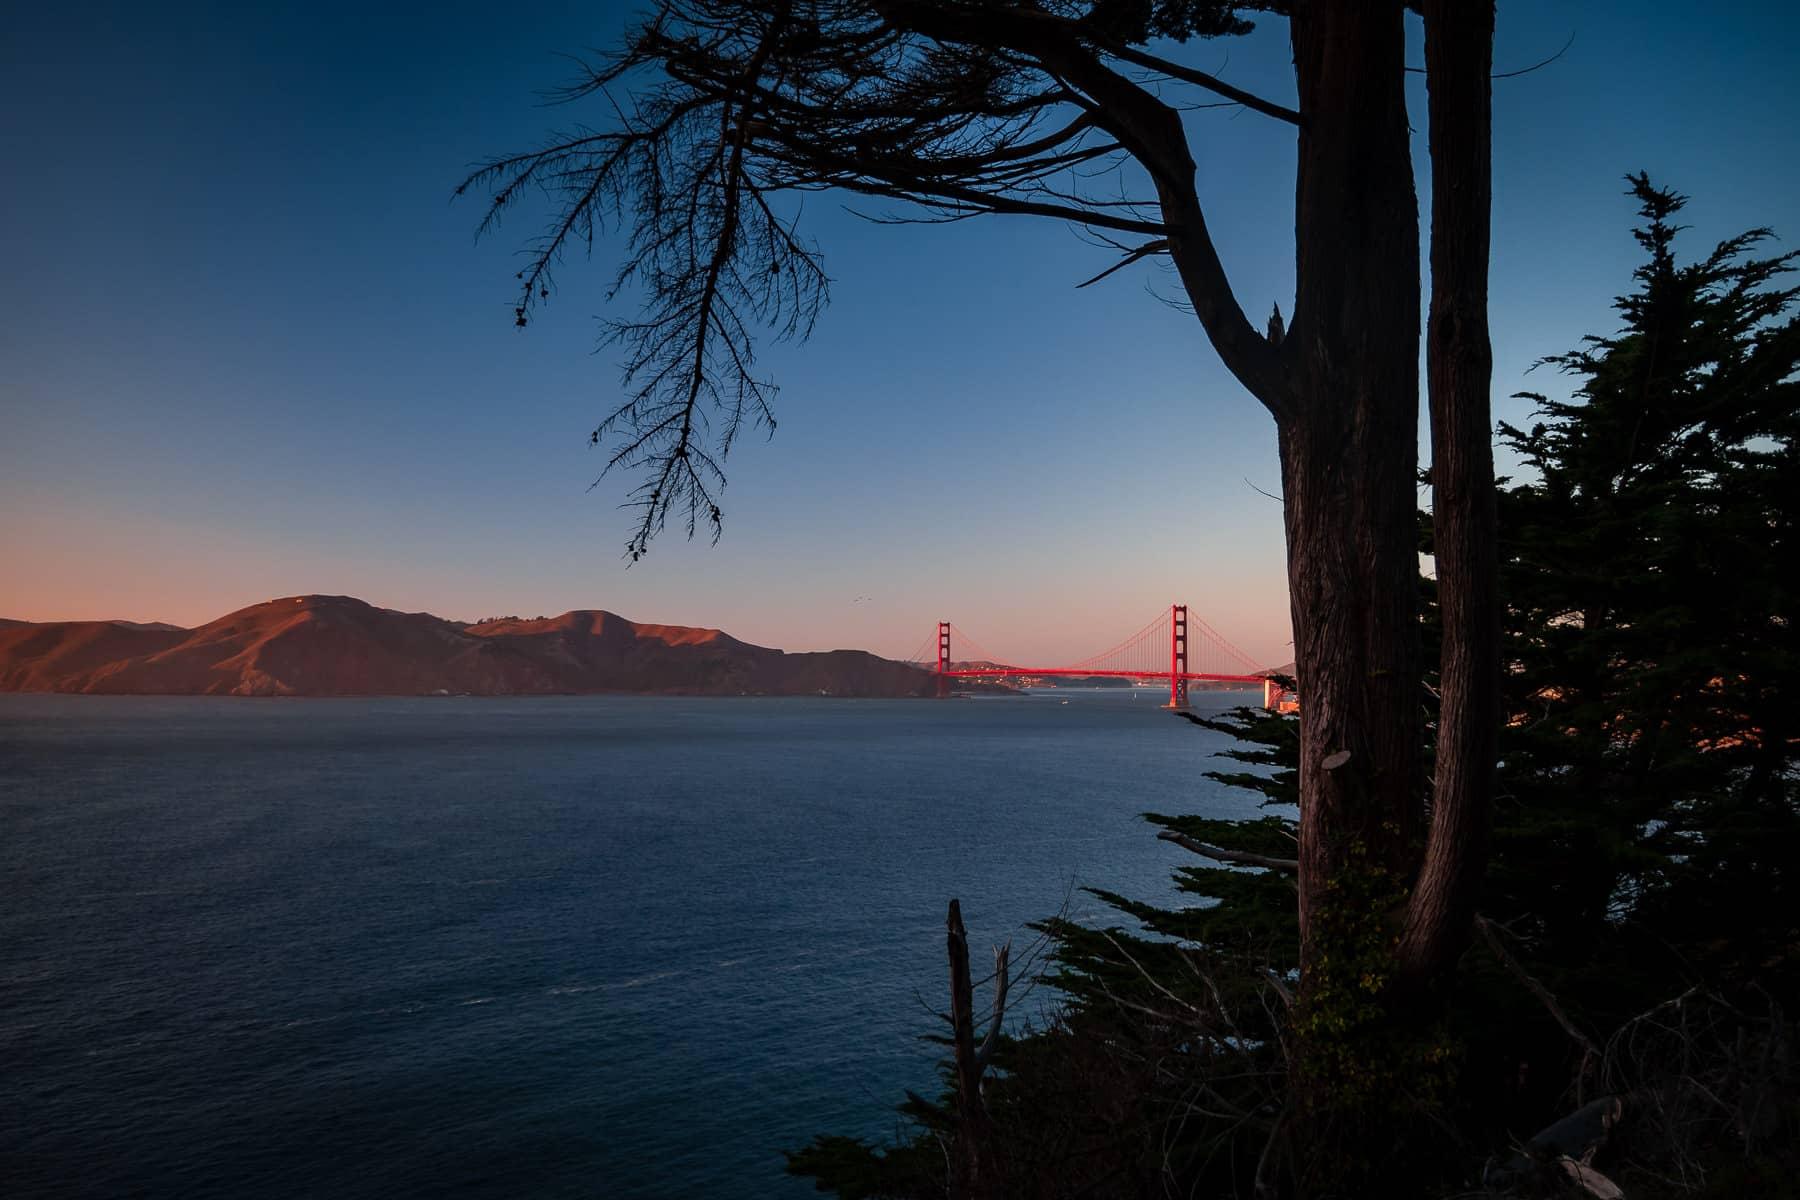 The last light of day illuminates San Francisco's Golden Gate Bridge.